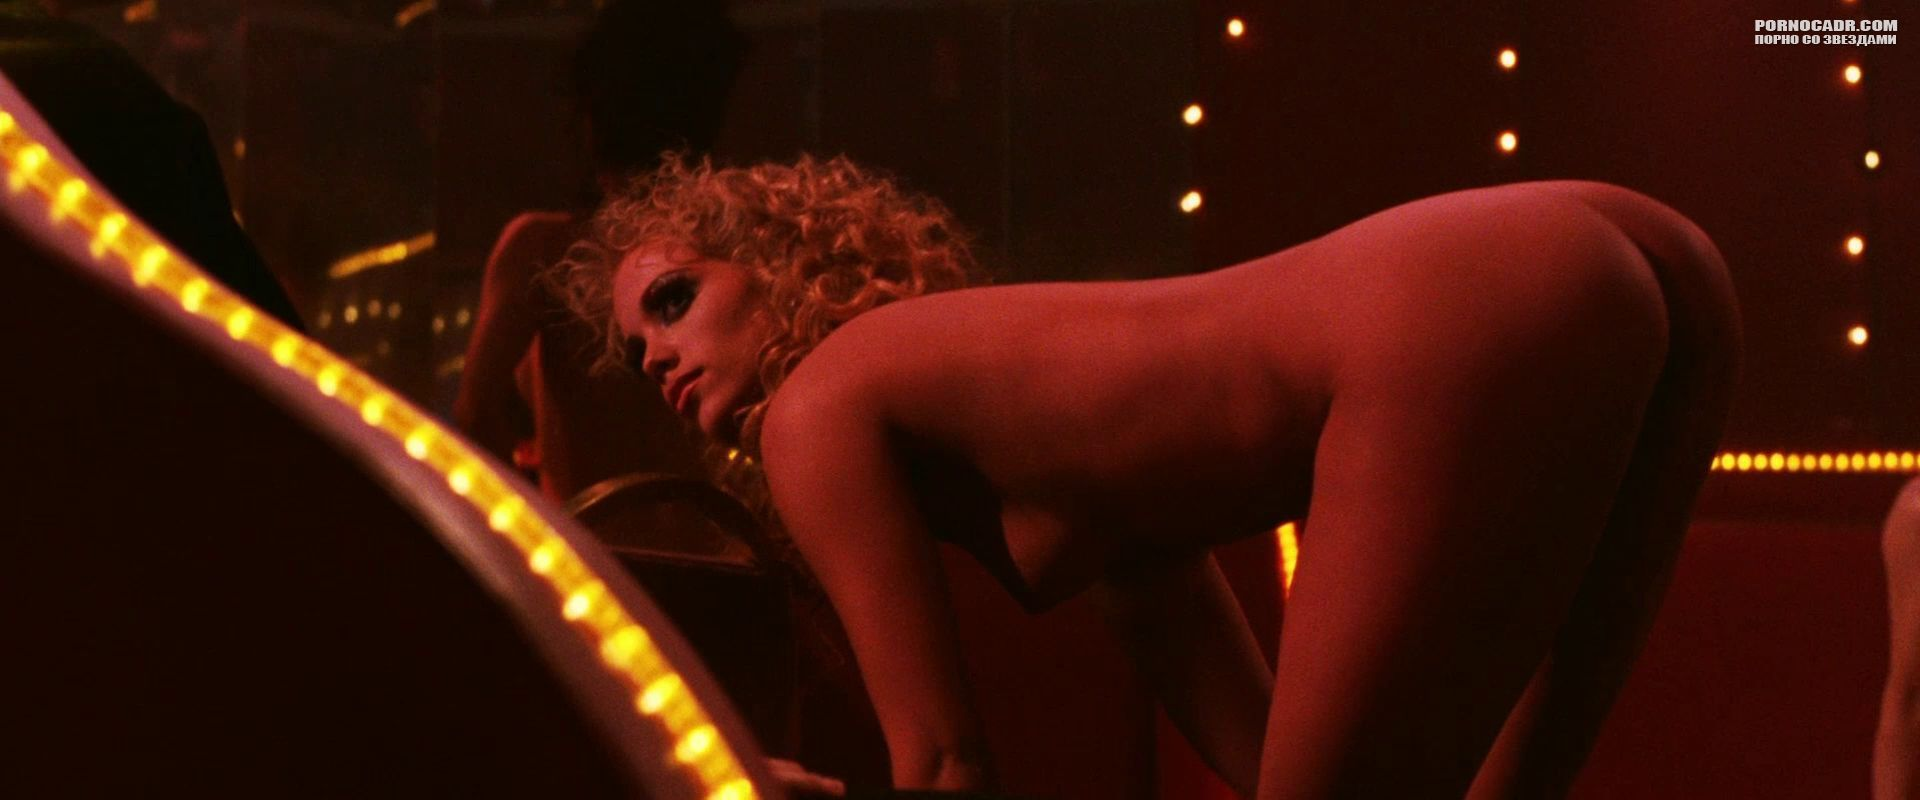 hot-vegas-nude-showgirls